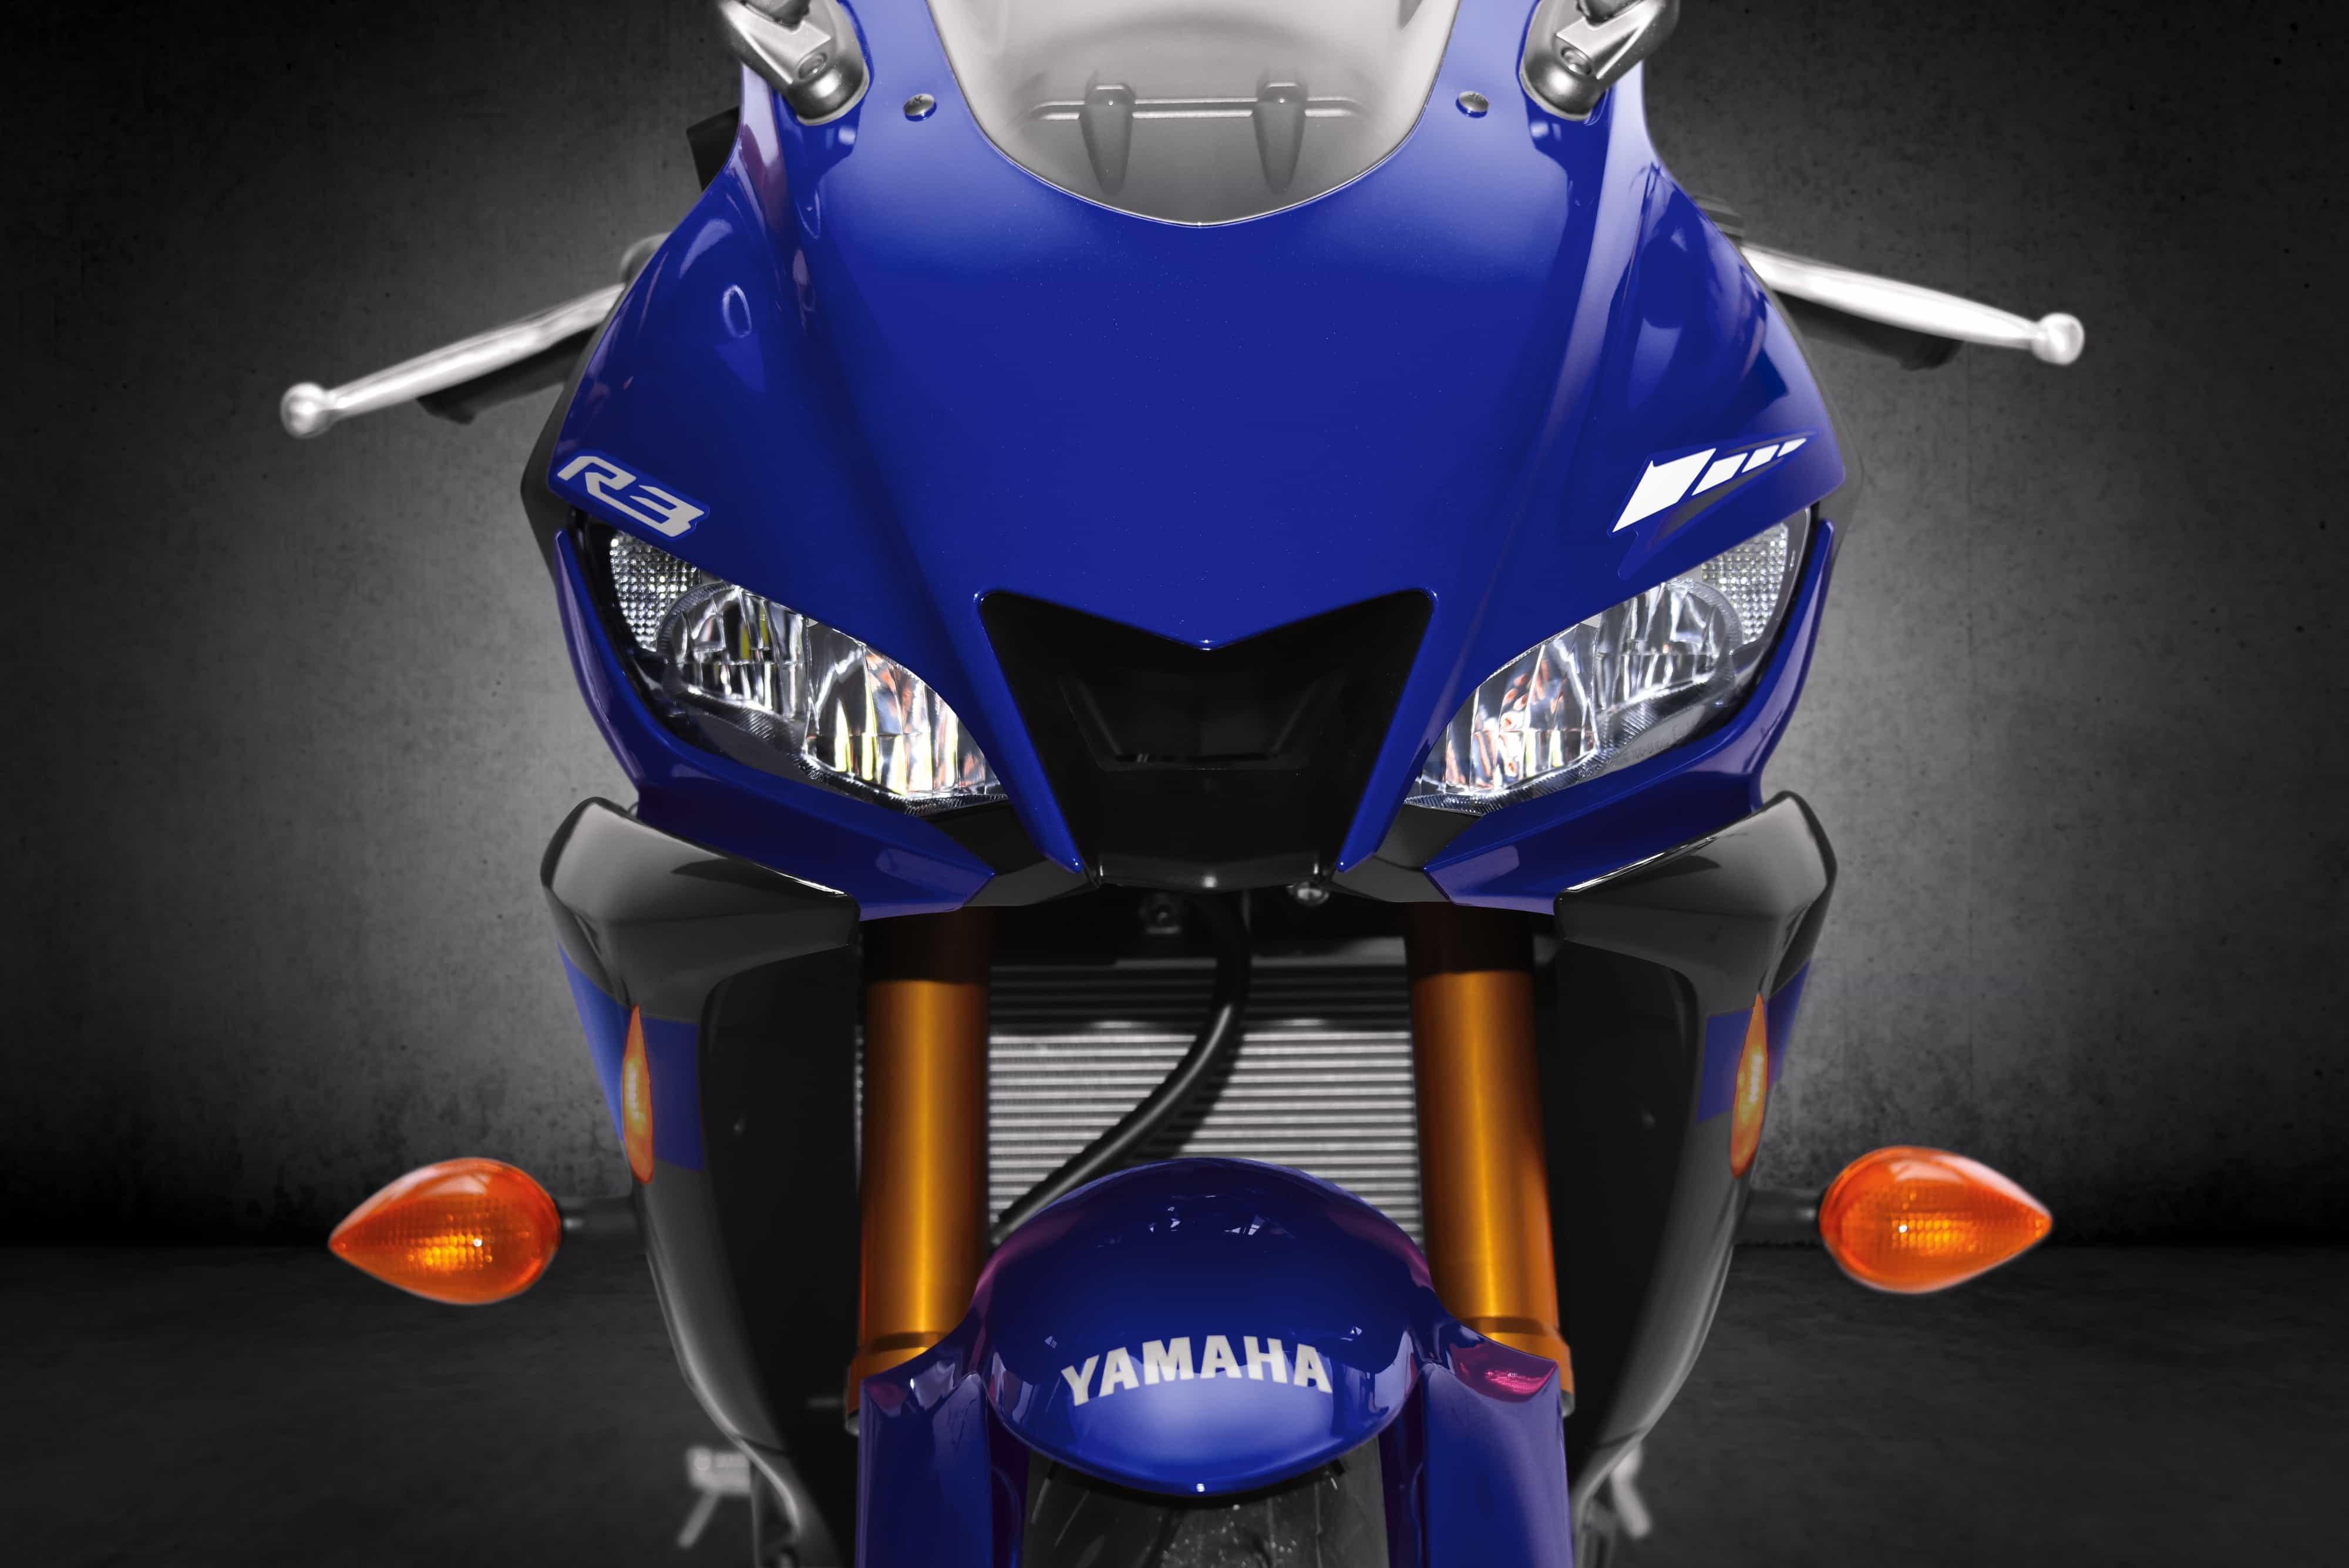 YAMAHA YZF-R3 (2019年式樣) 預購